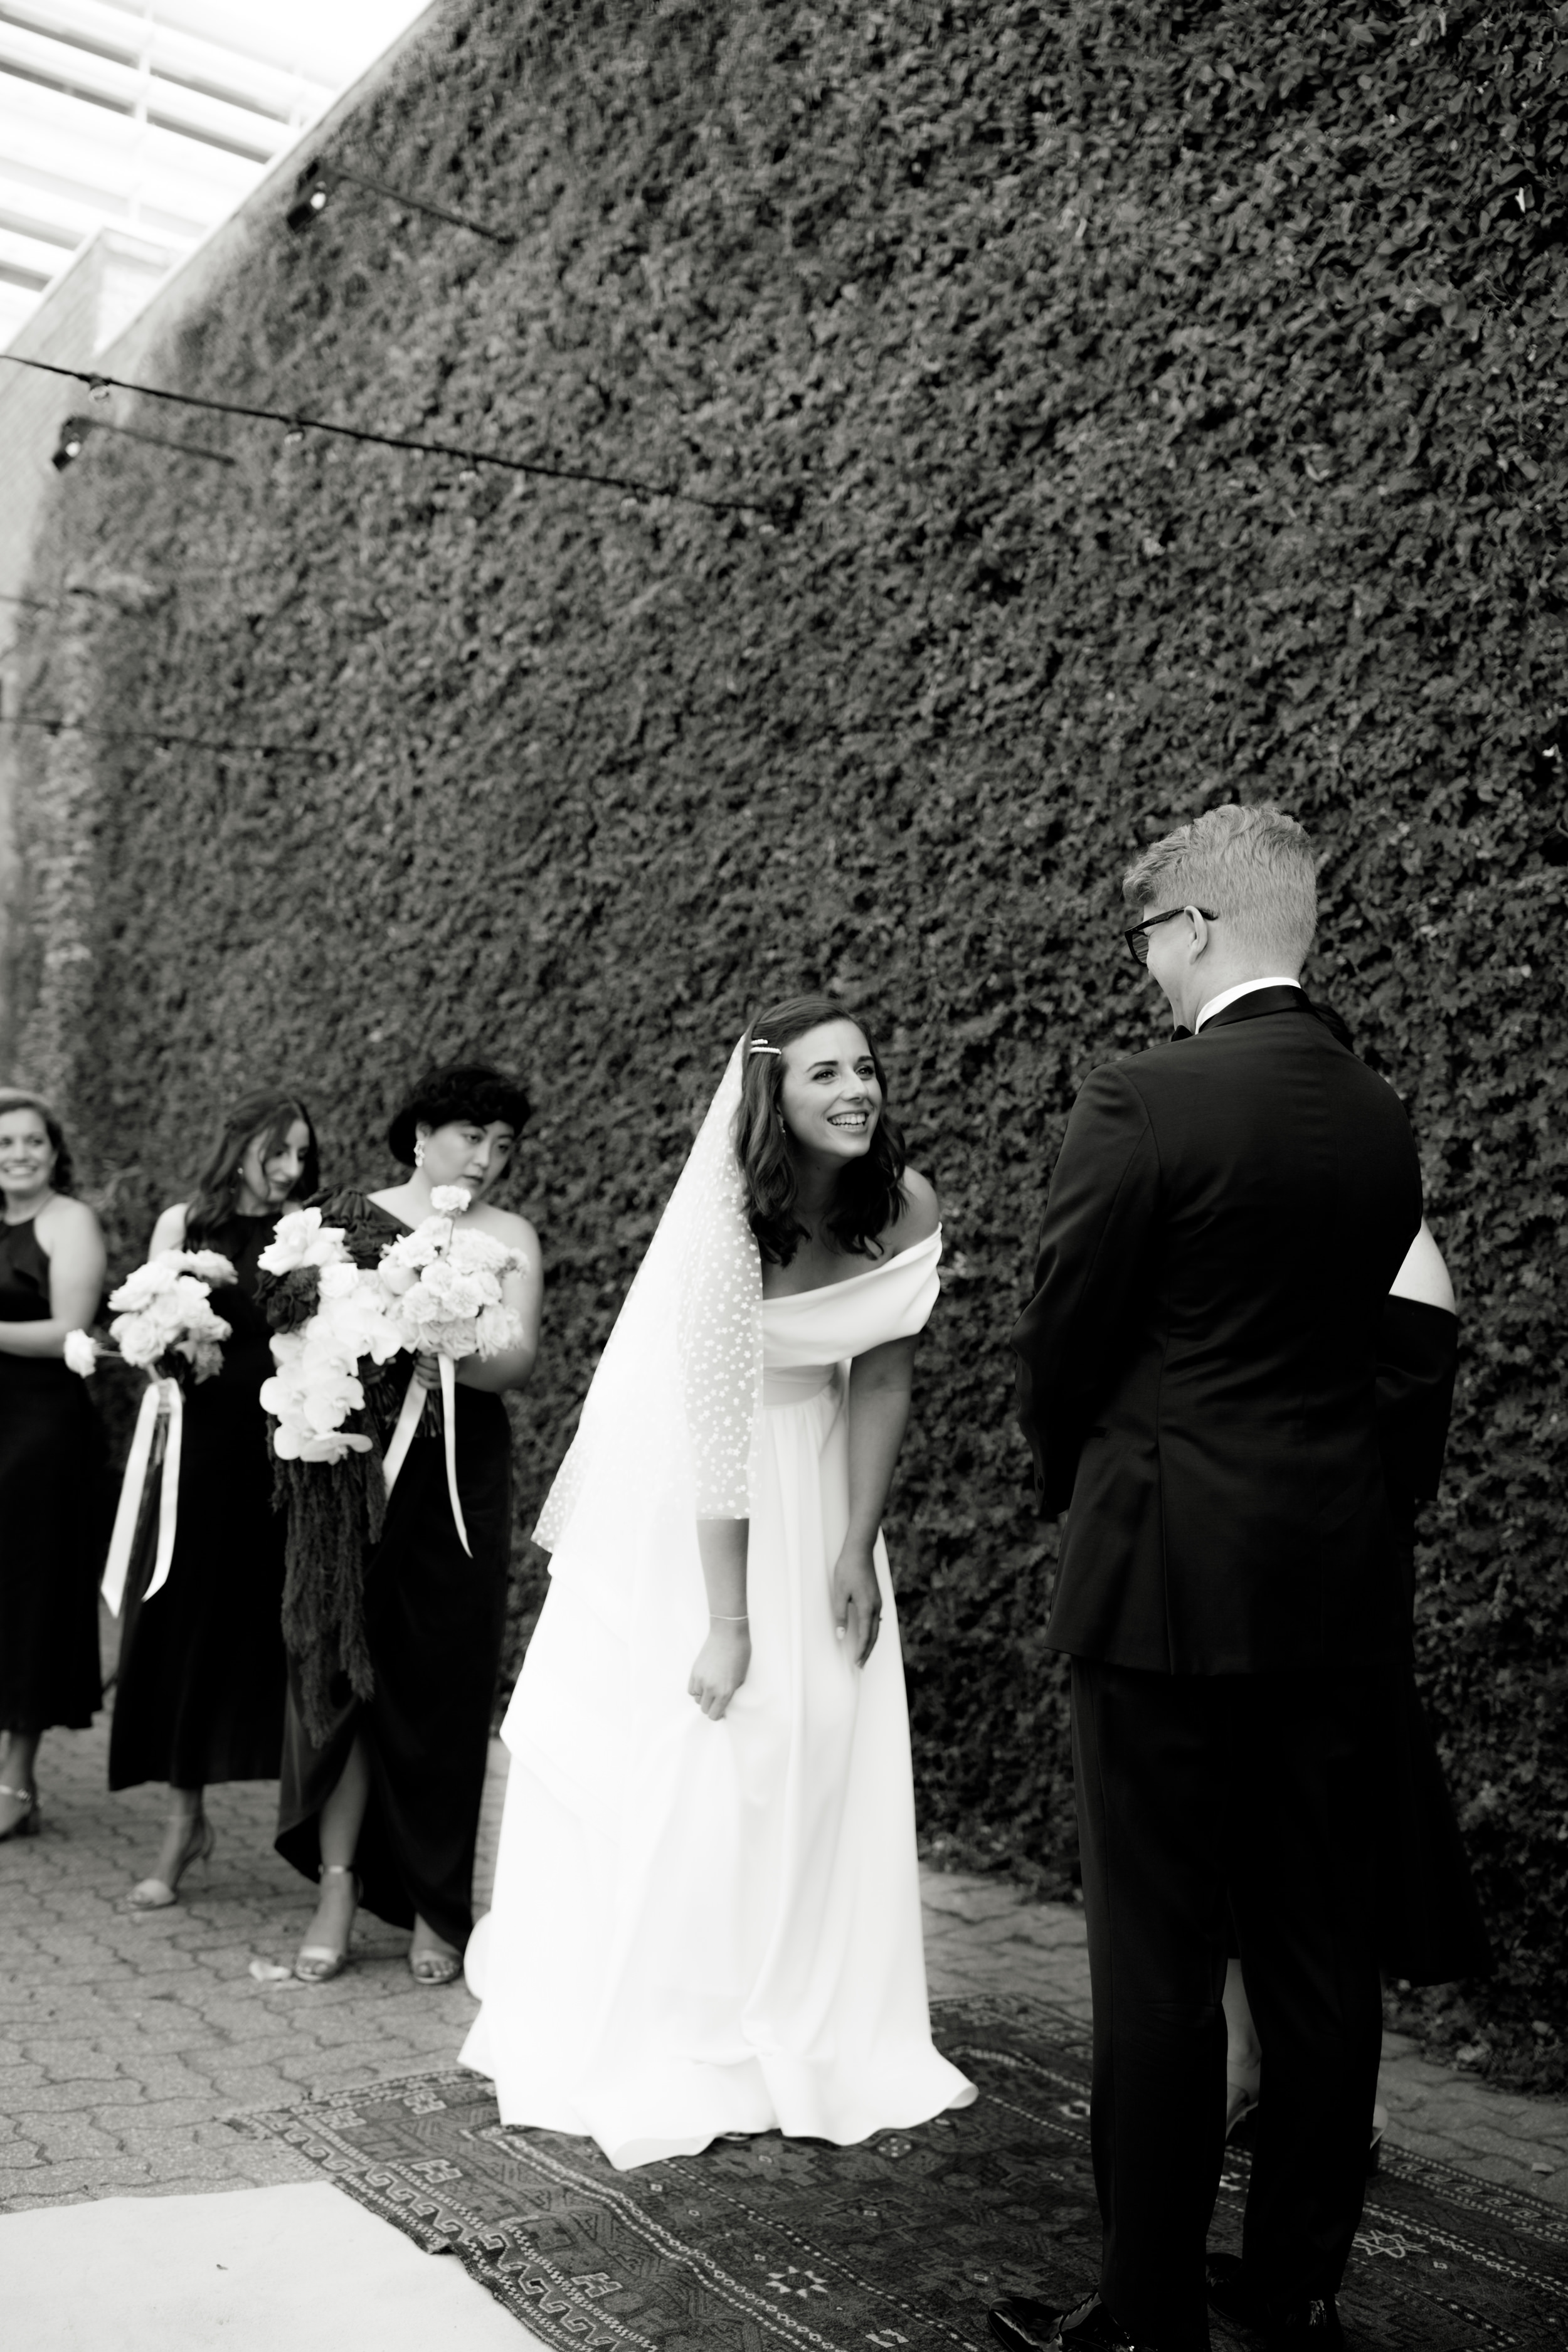 I-Got-You-Babe-Weddings-Tahlia&Mitch-Butler-Lane-Wedding0100.JPG